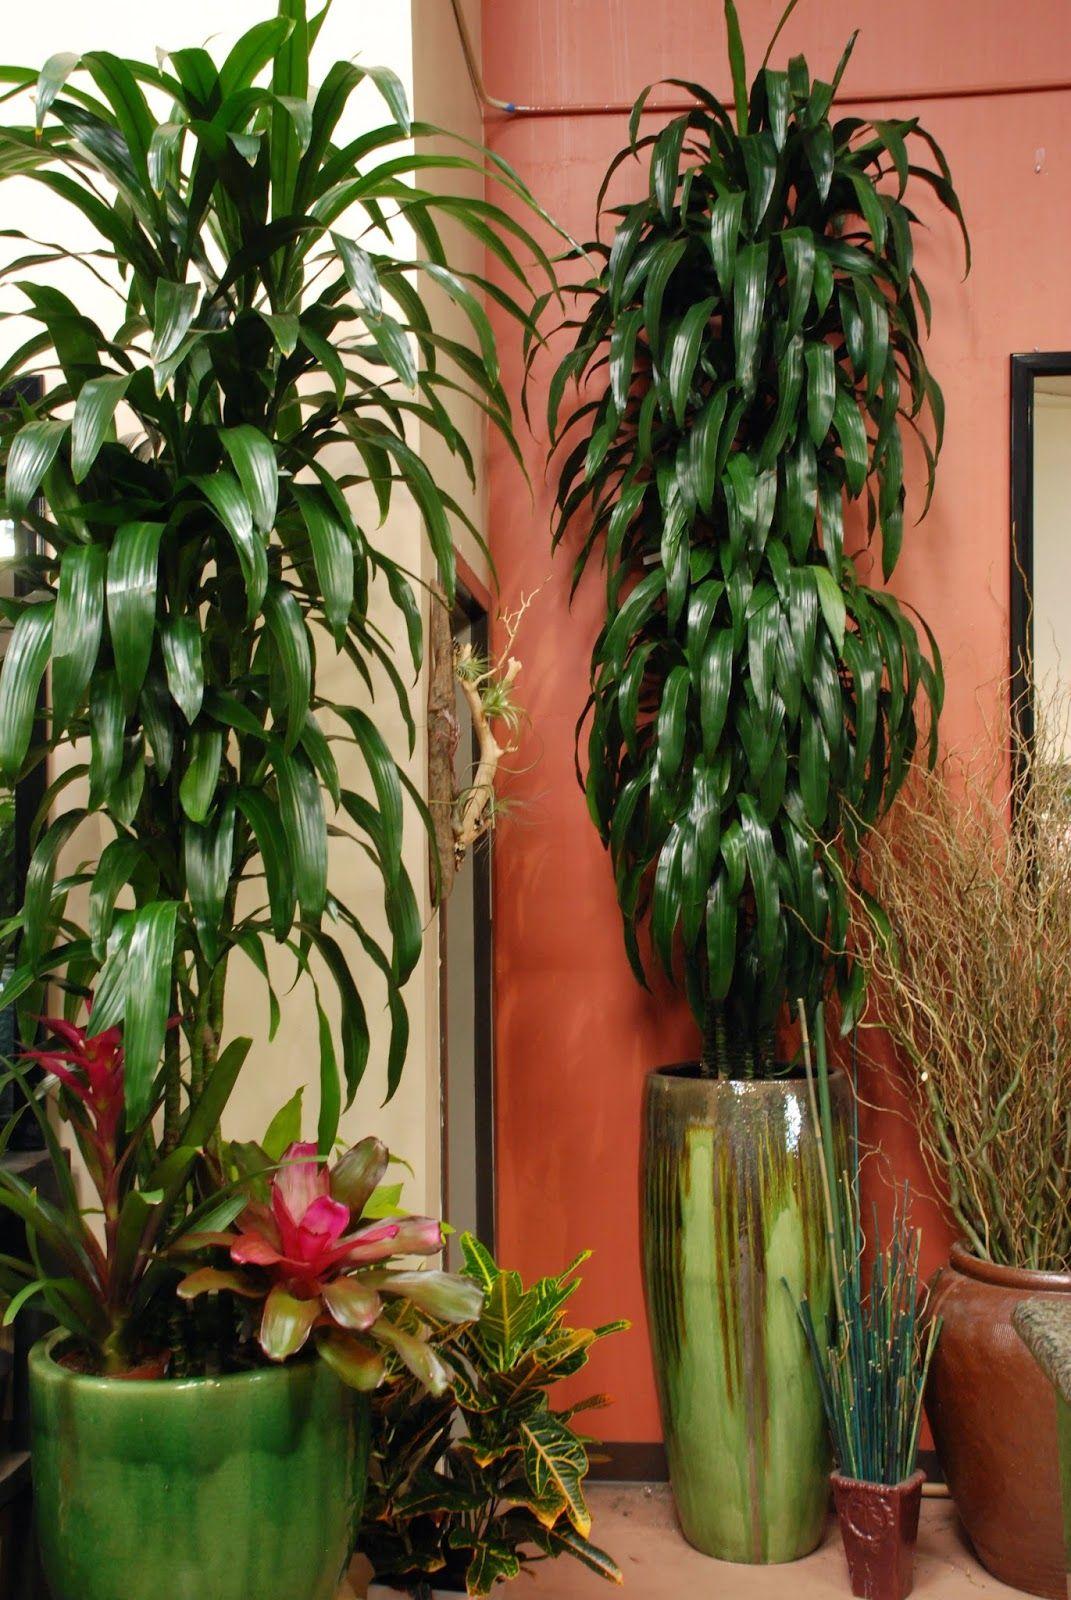 Dracaena craig house plant care dracaena plant